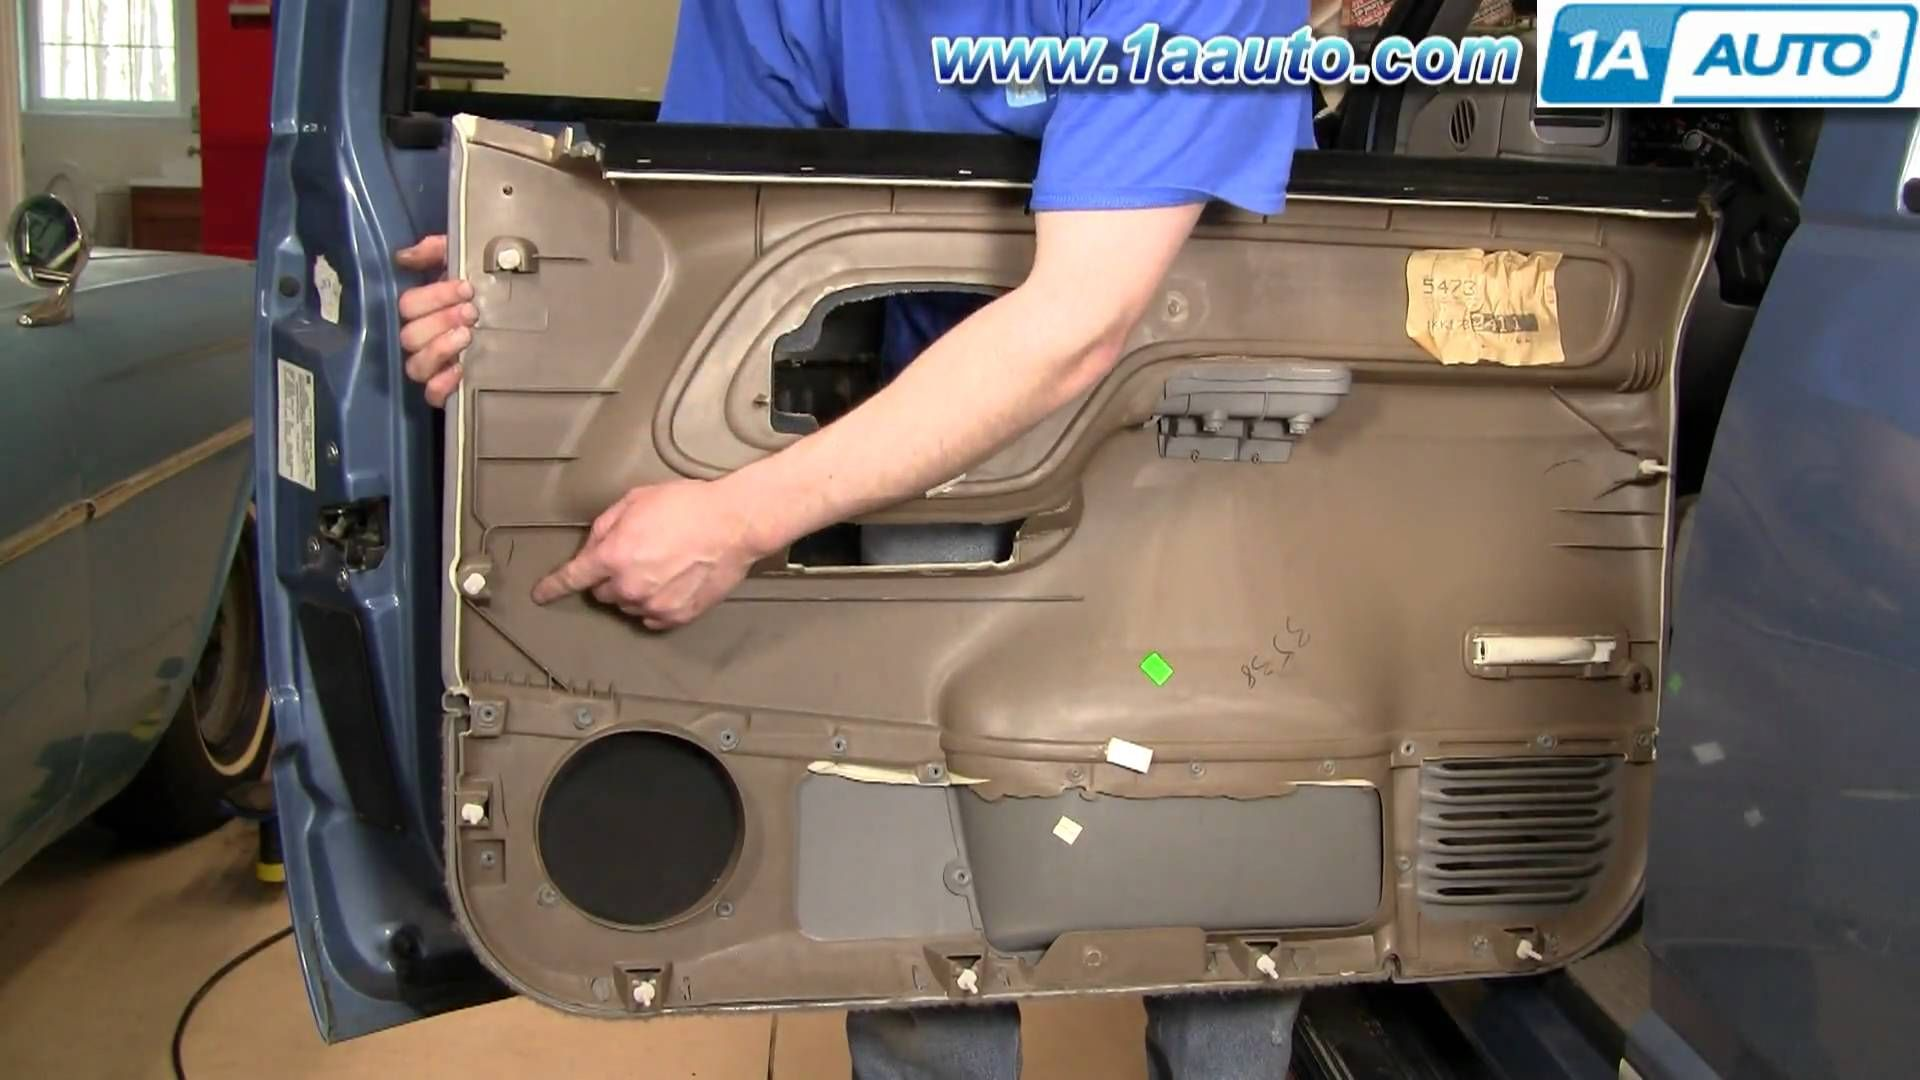 How To Install Replace Door Panel Chevy Gmc Pickup Truck Or Suv 95 98 1aauto Com Barn Door Interior Barn Doors Gmc Pickup Trucks